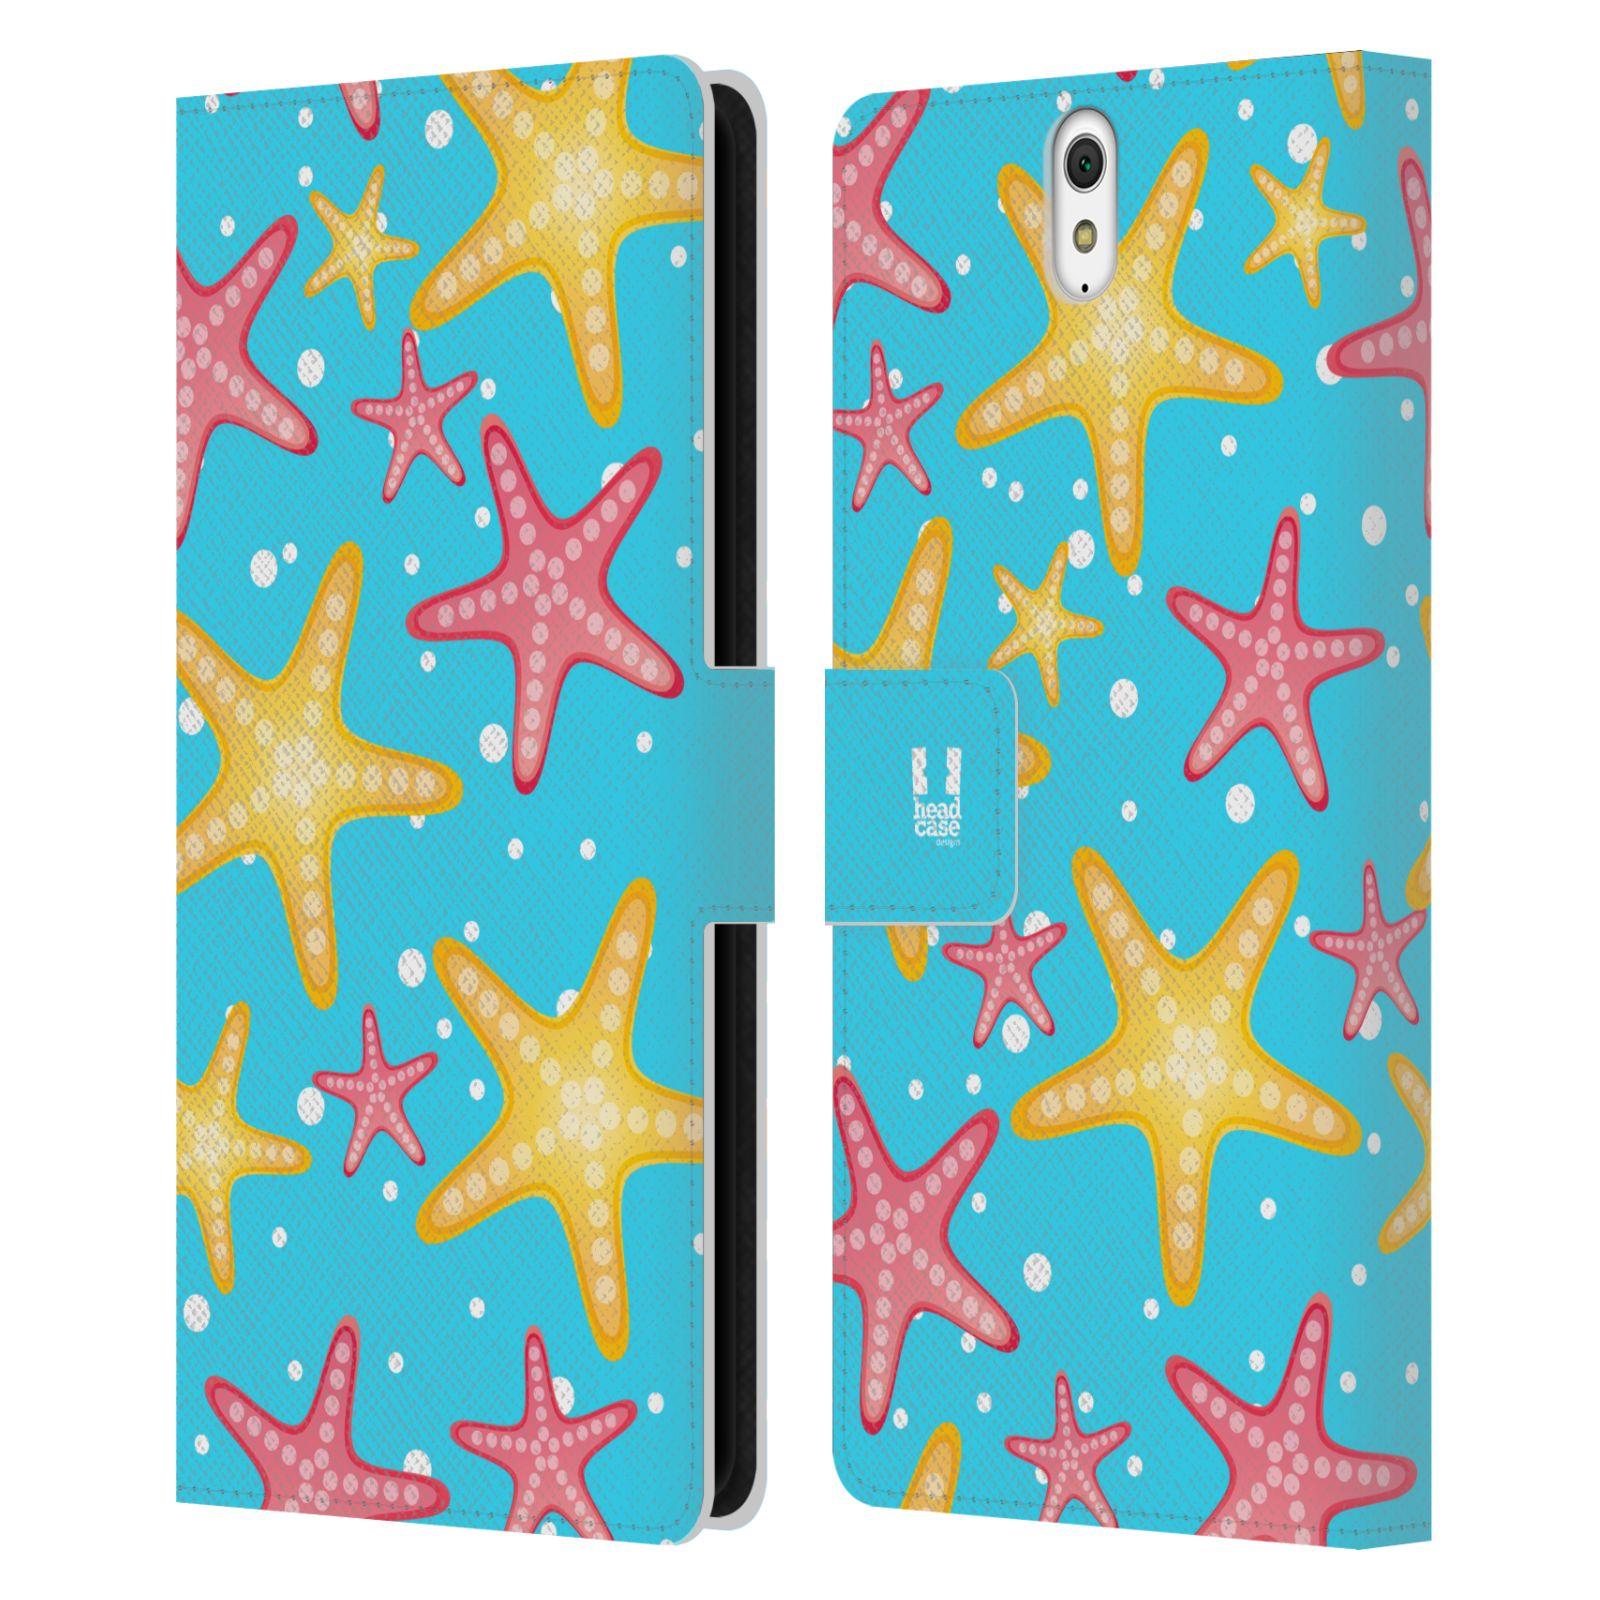 HEAD CASE Flipové pouzdro pro mobil SONY XPERIA C5 Ultra Mořský živočich hvězdice modrá barva pozadí